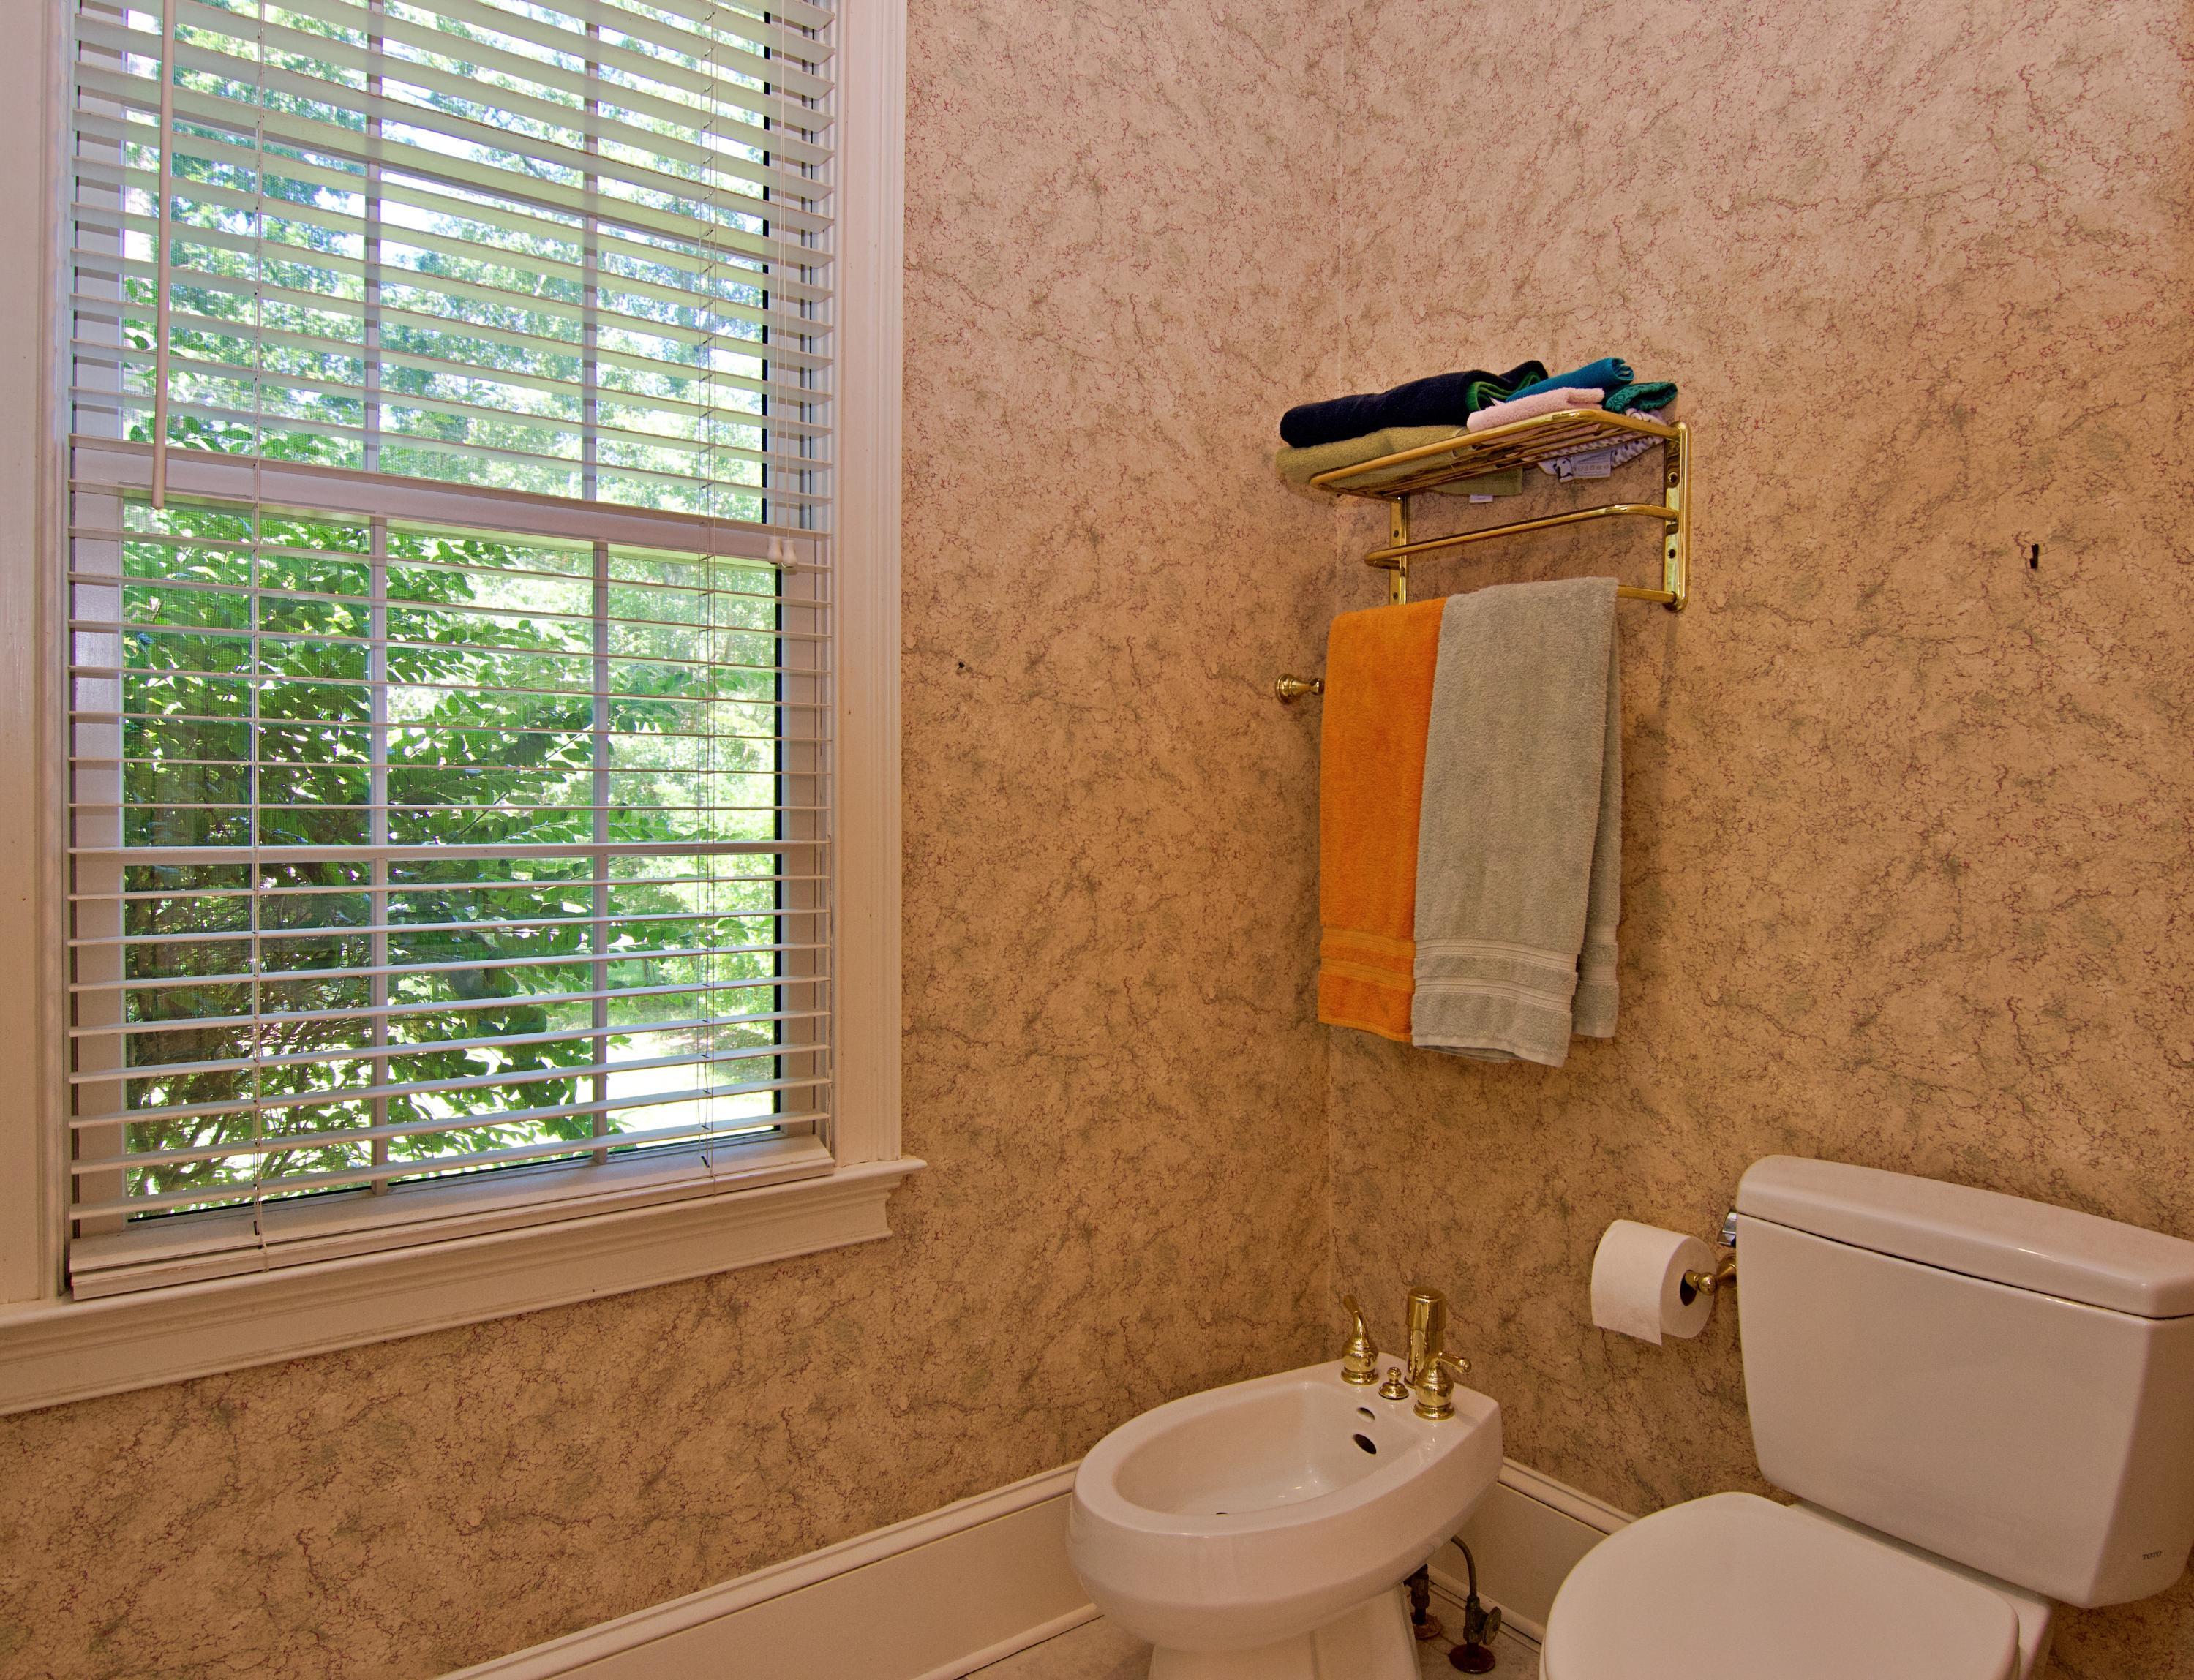 Coosaw Creek Country Club Homes For Sale - 4219 Buck Creek, North Charleston, SC - 10